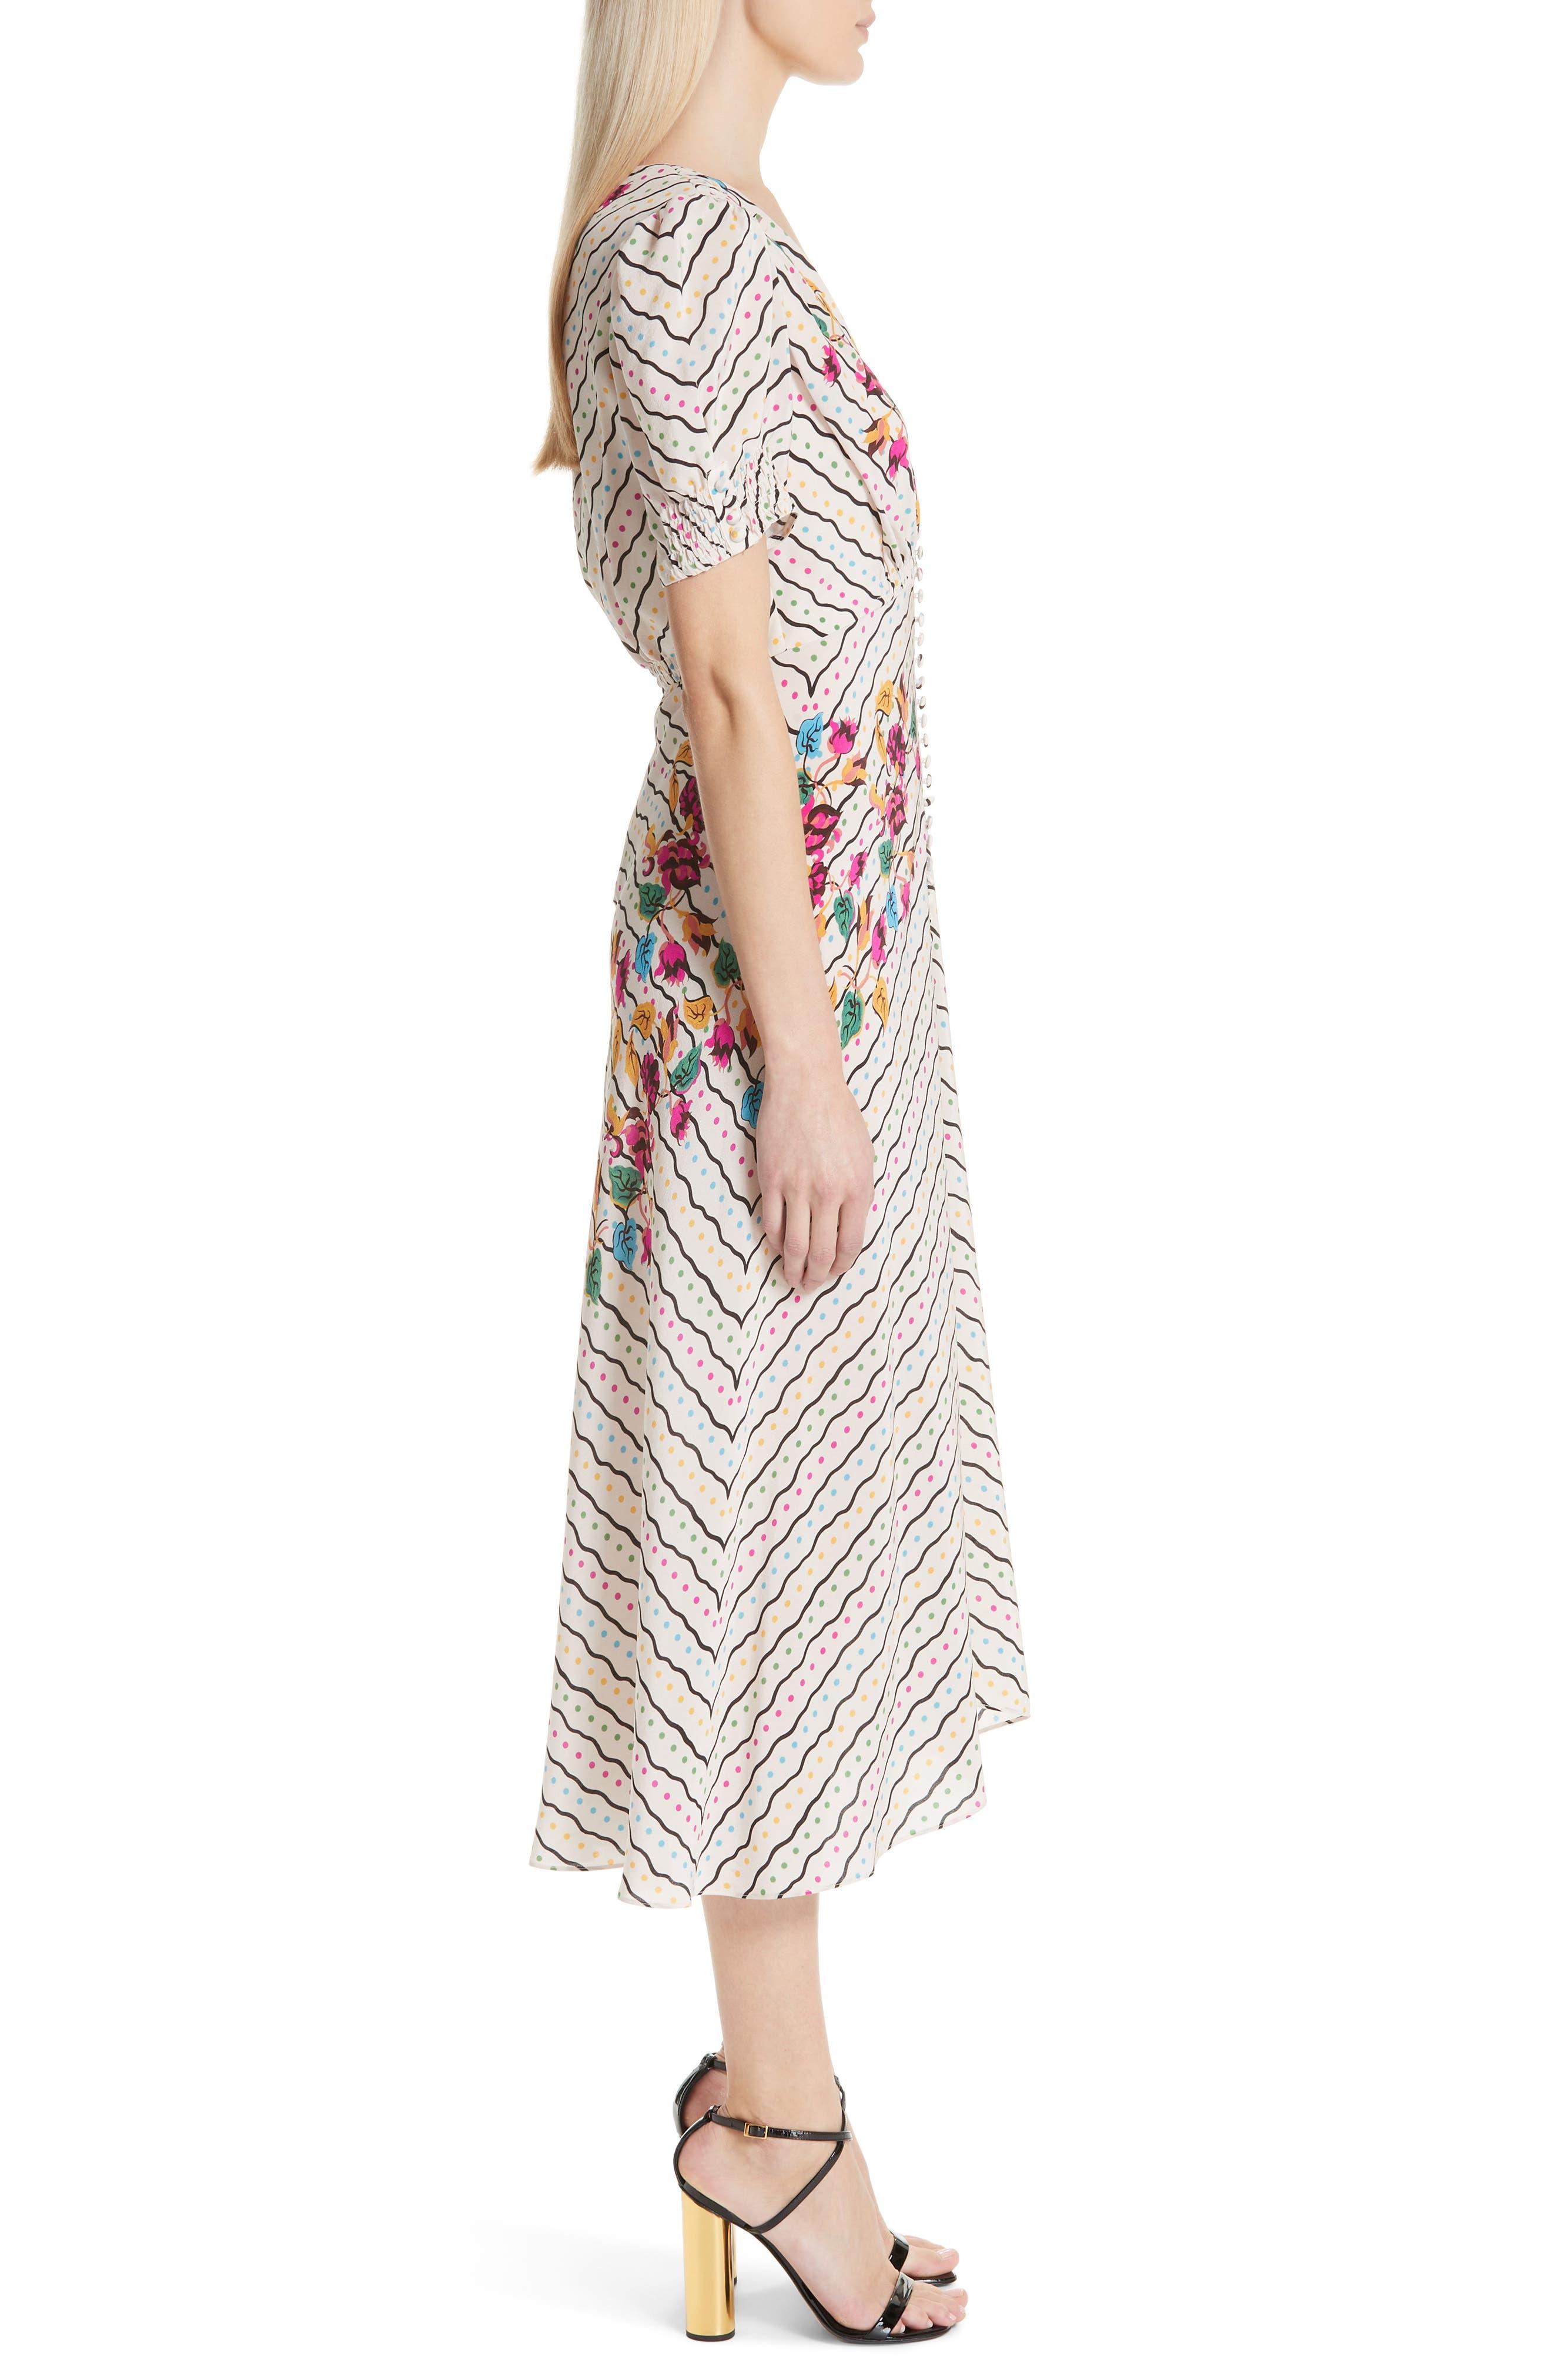 SALONI, Lea Silk Midi Dress, Alternate thumbnail 4, color, JAPONICA WIGGLE PLACEMENT